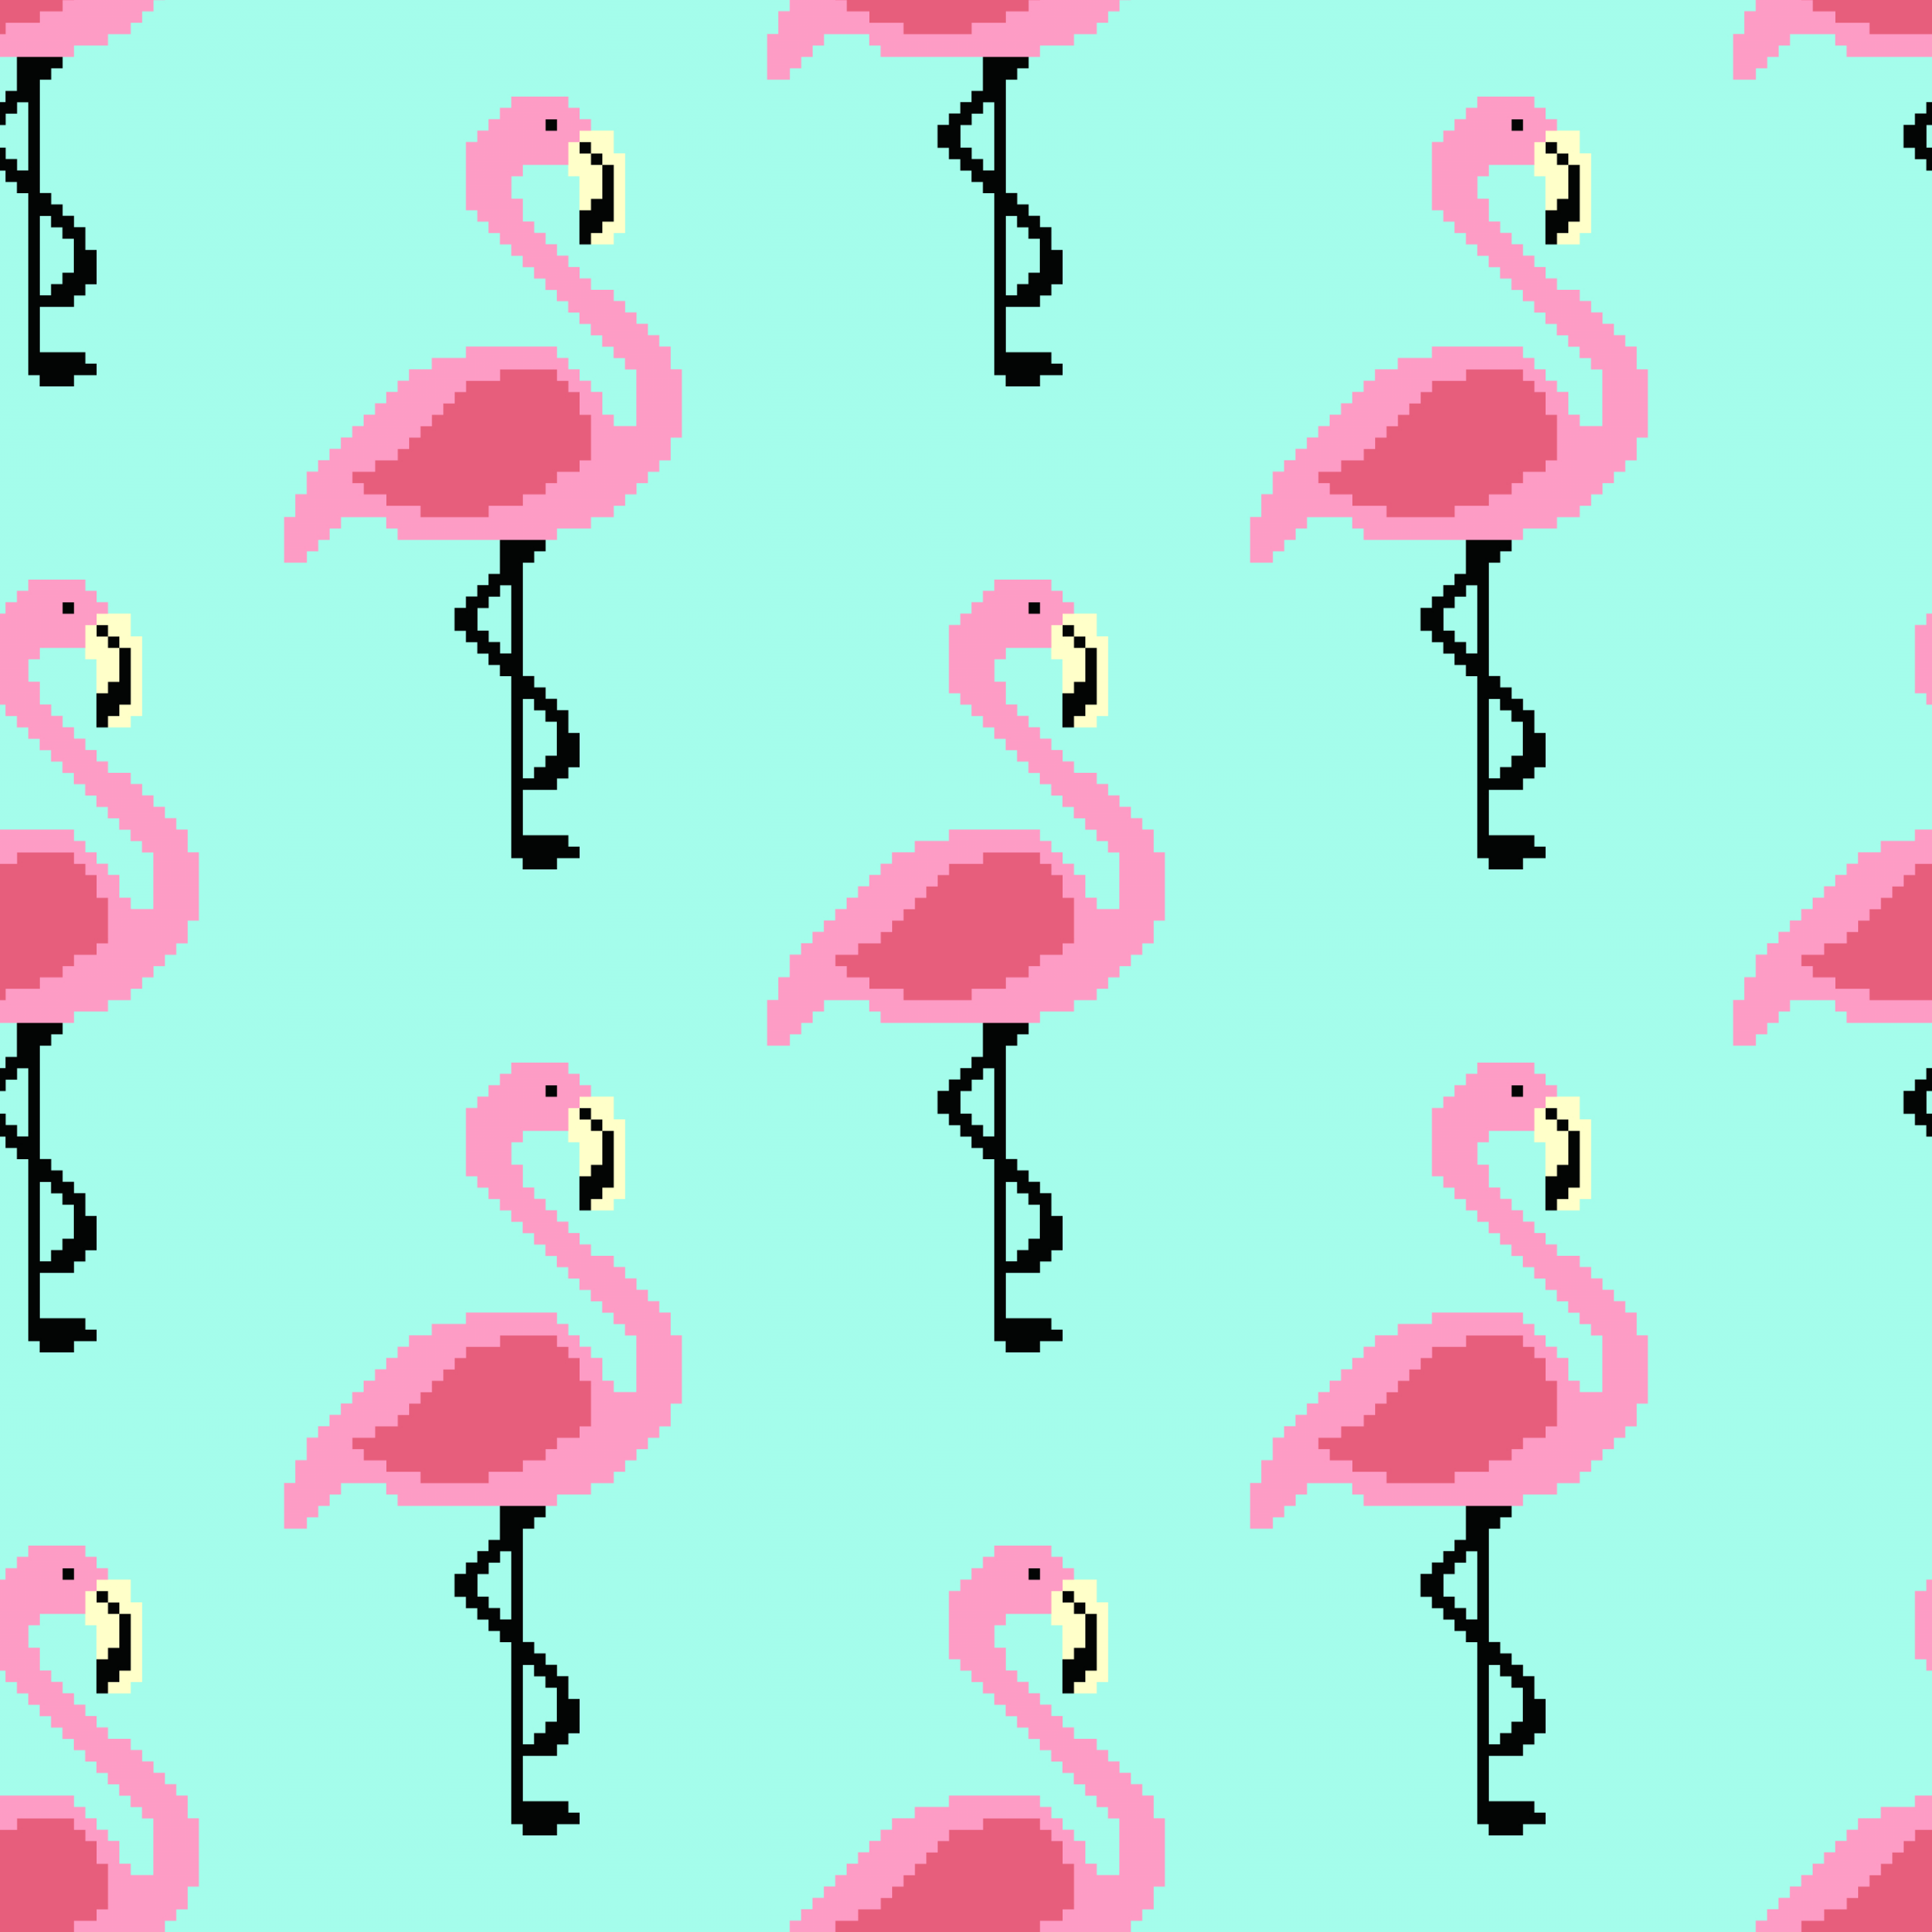 Flamant Rose Free Vector Art - (309 Free Downloads) intérieur Pixel Art Flamant Rose